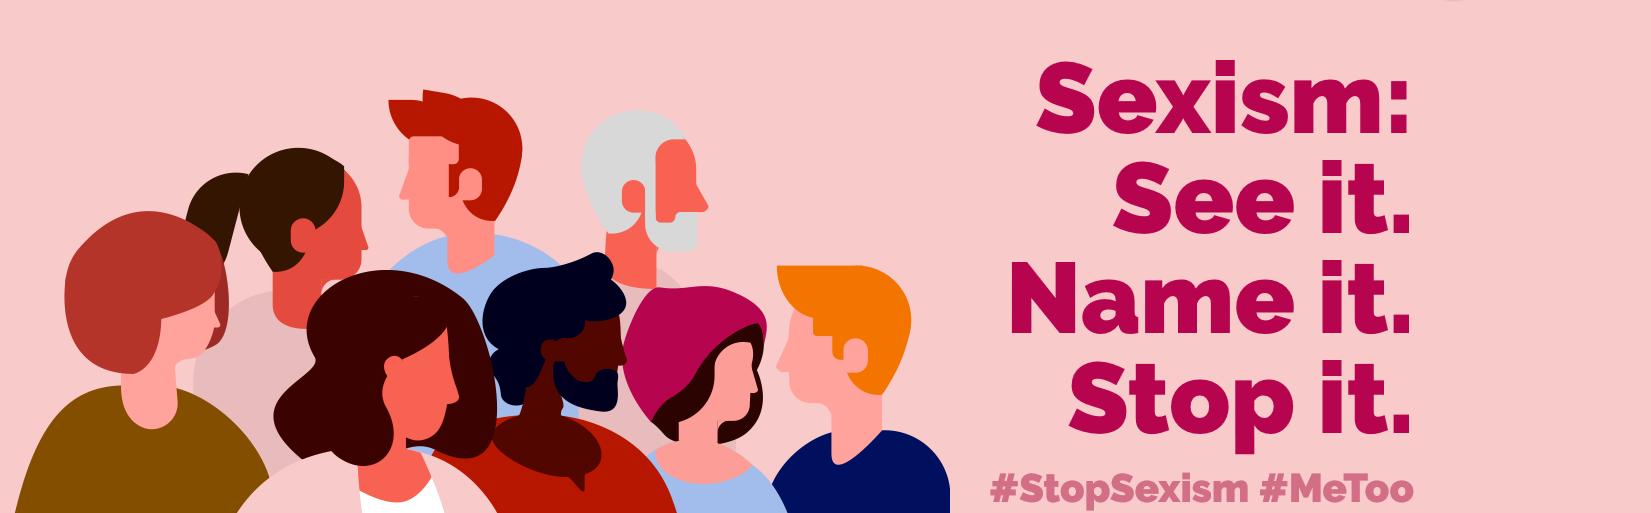 stop-sexism